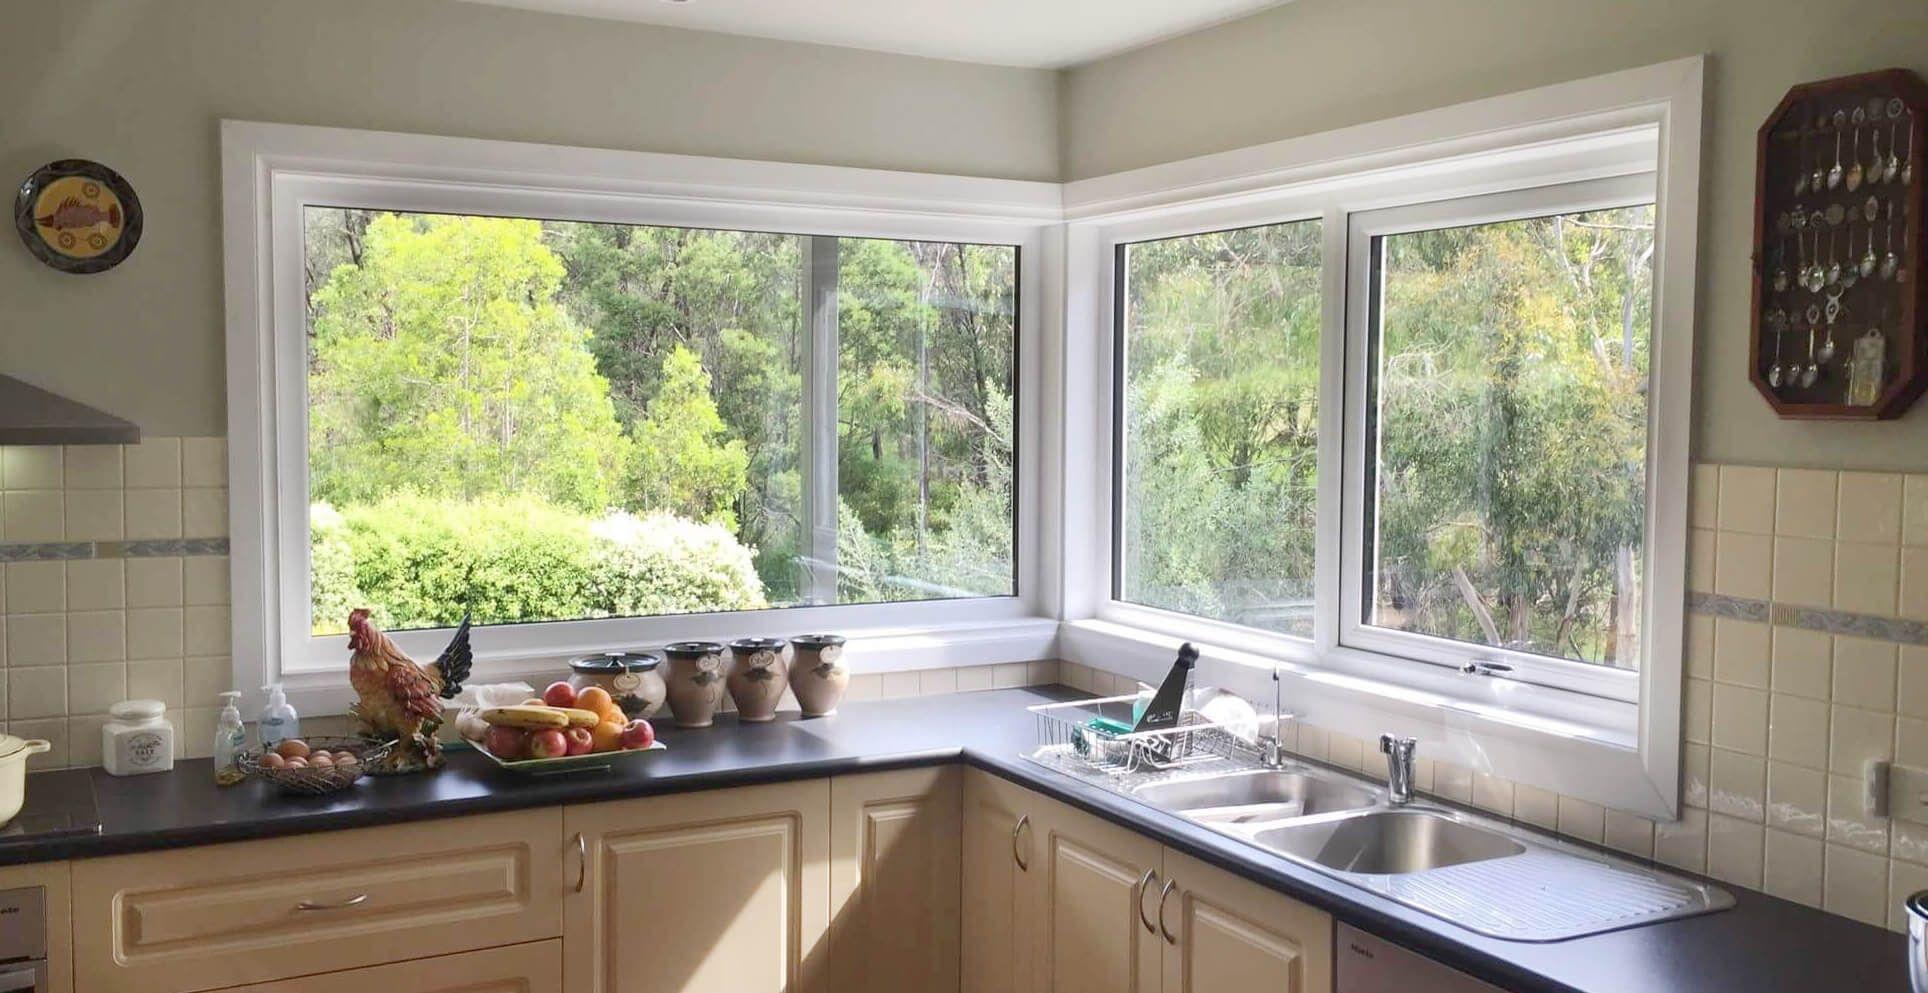 Corner window kitchen sink  image result for corner windows  corner window in   pinterest